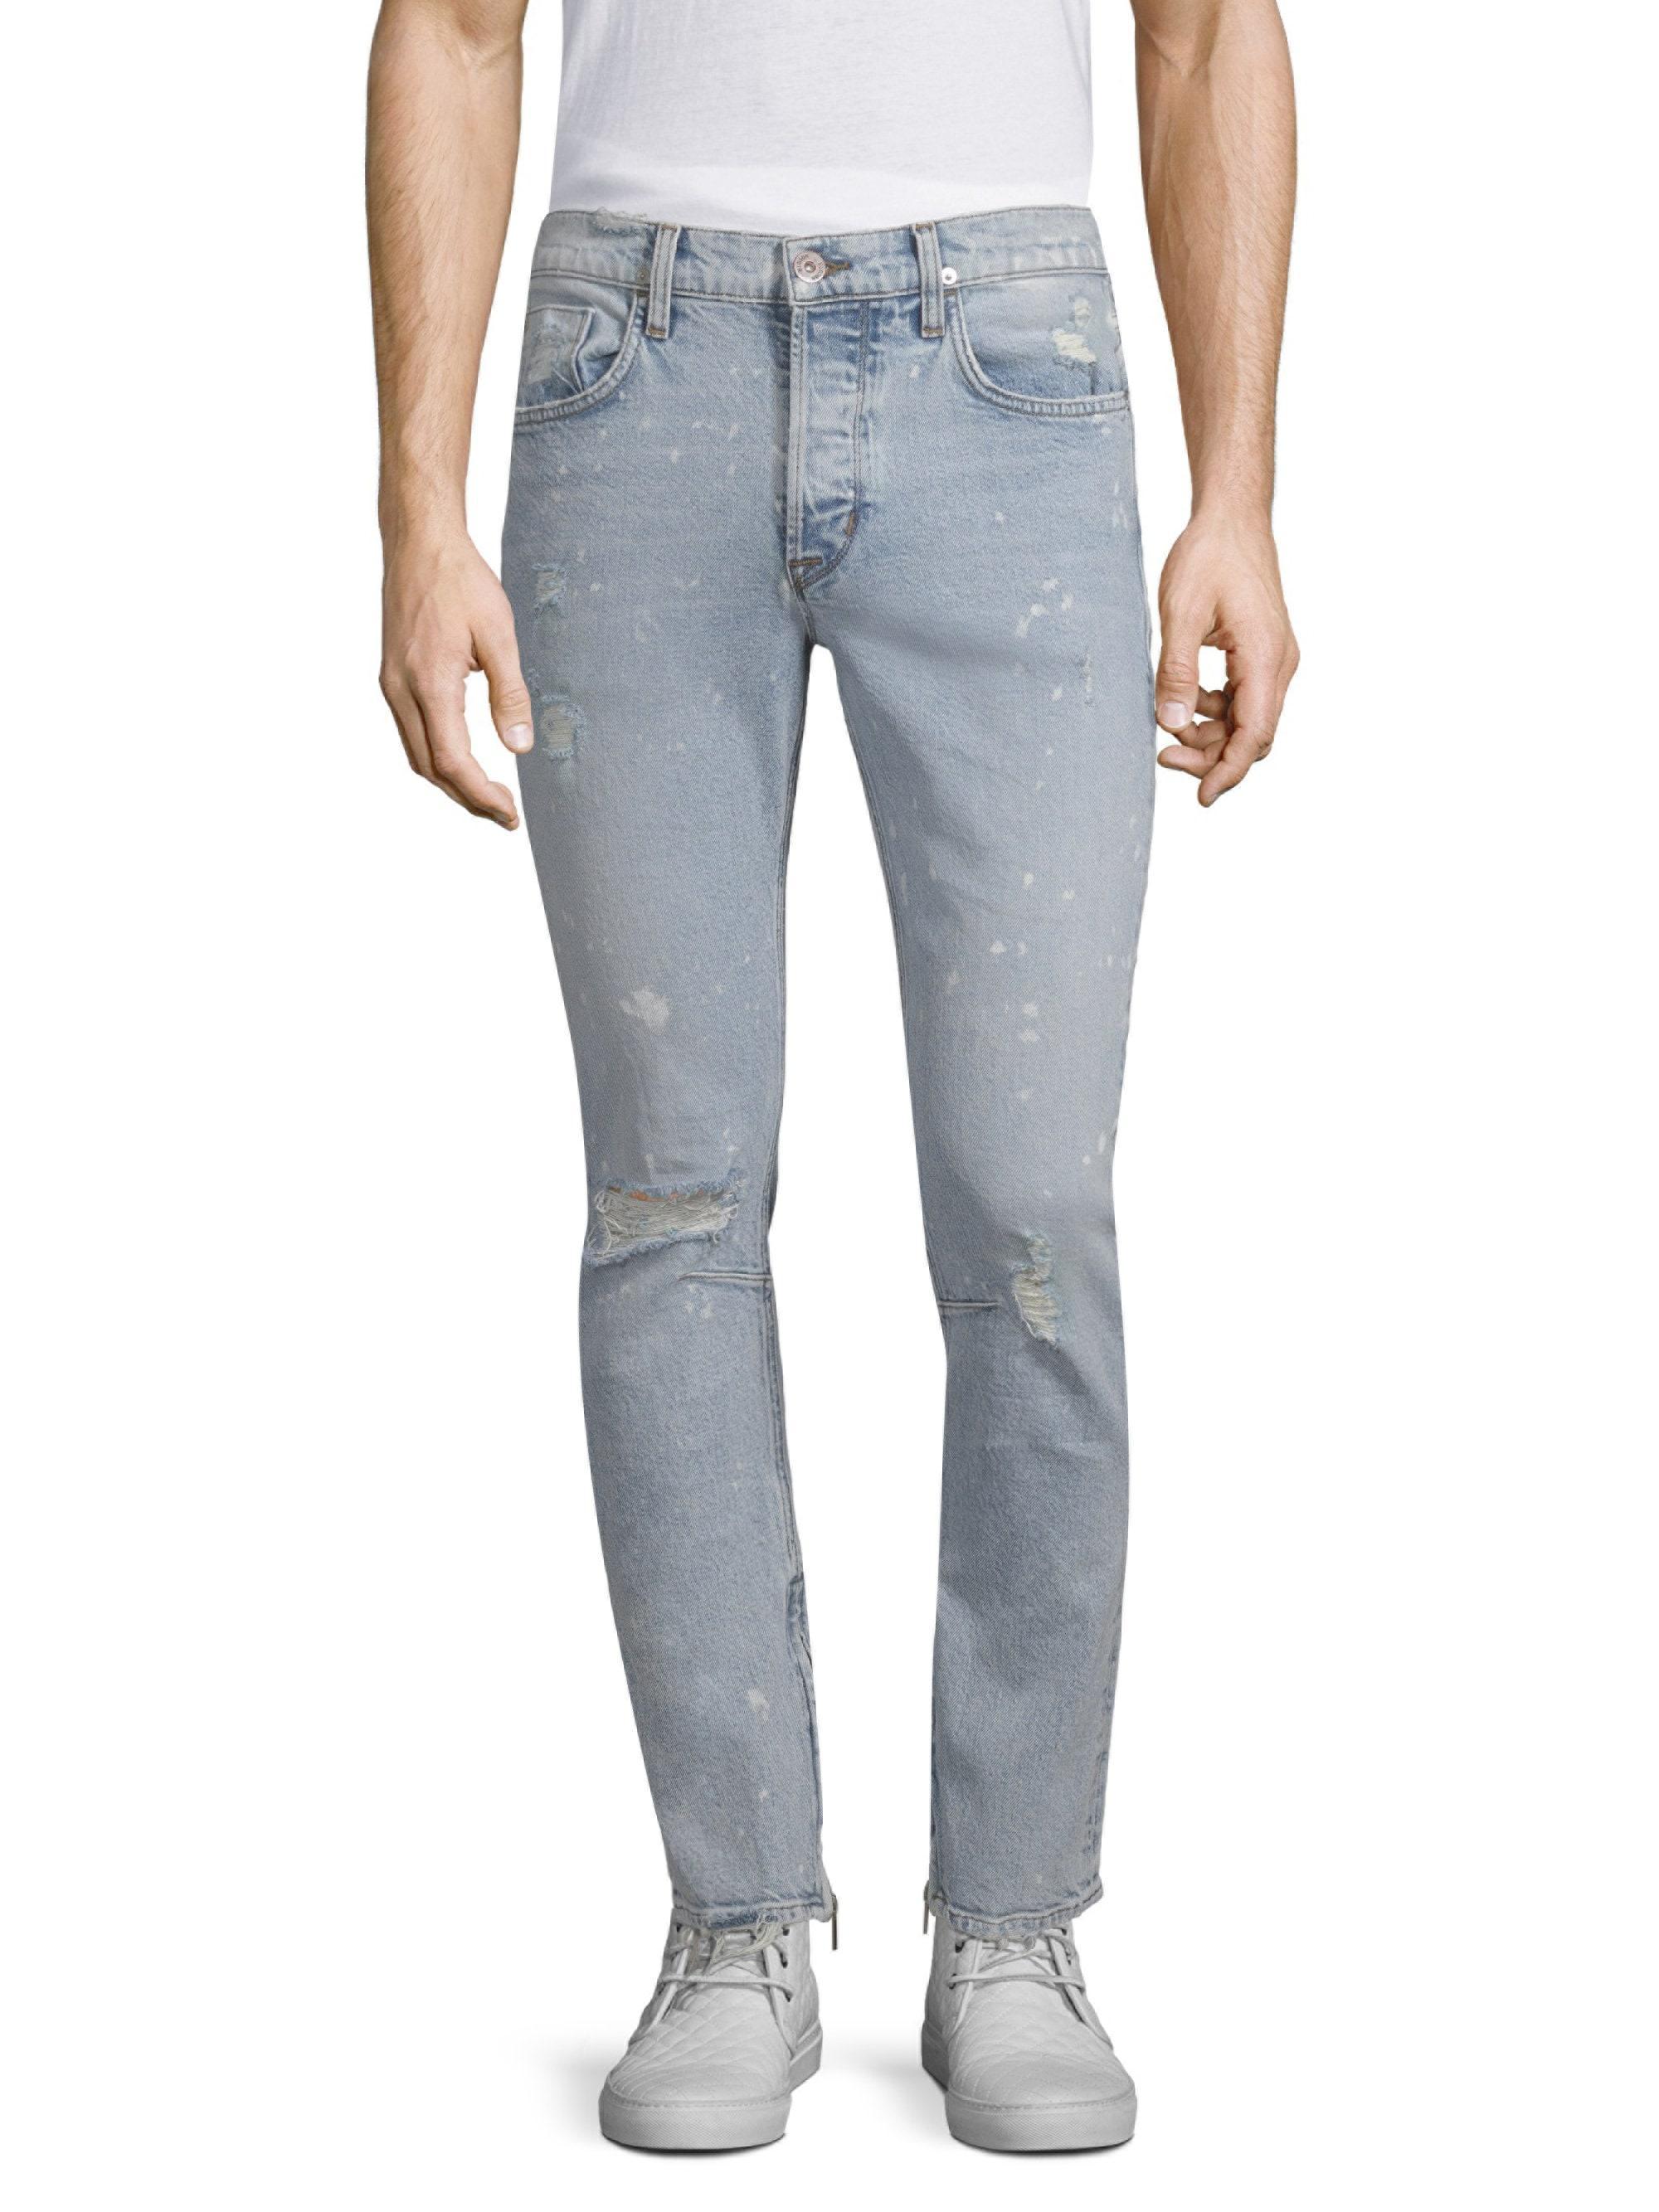 ffa57dbdd9b Lyst - Hudson Jeans Men's Vaughn Skinny Cotton Ankle Zip Jeans ...